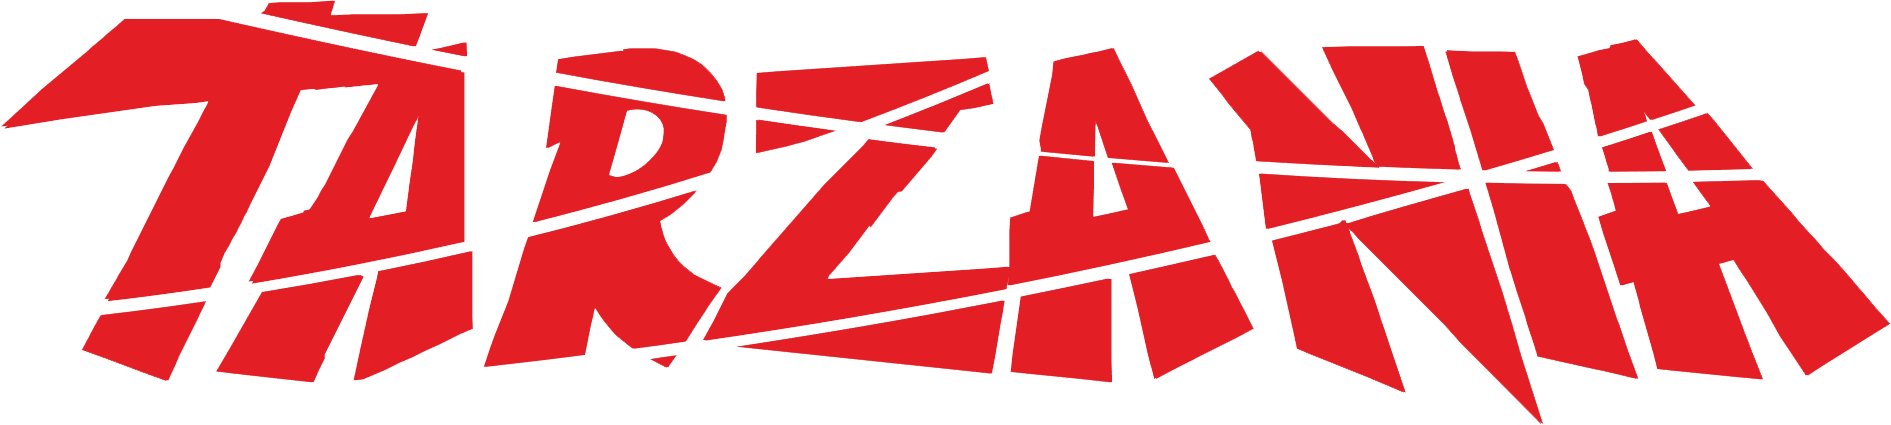 TARZANIA - Zipline Hrabovo